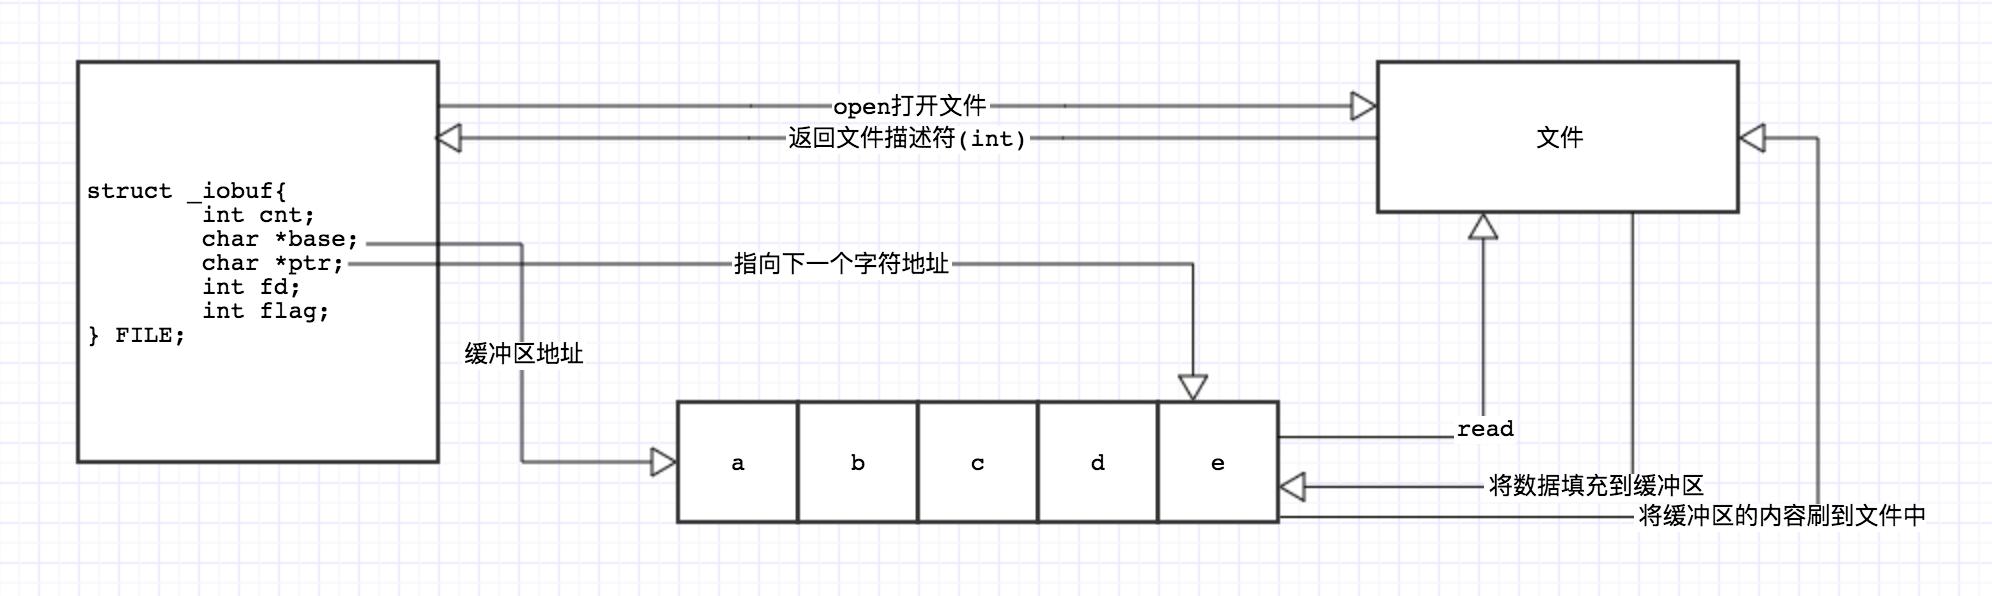 C语言 2